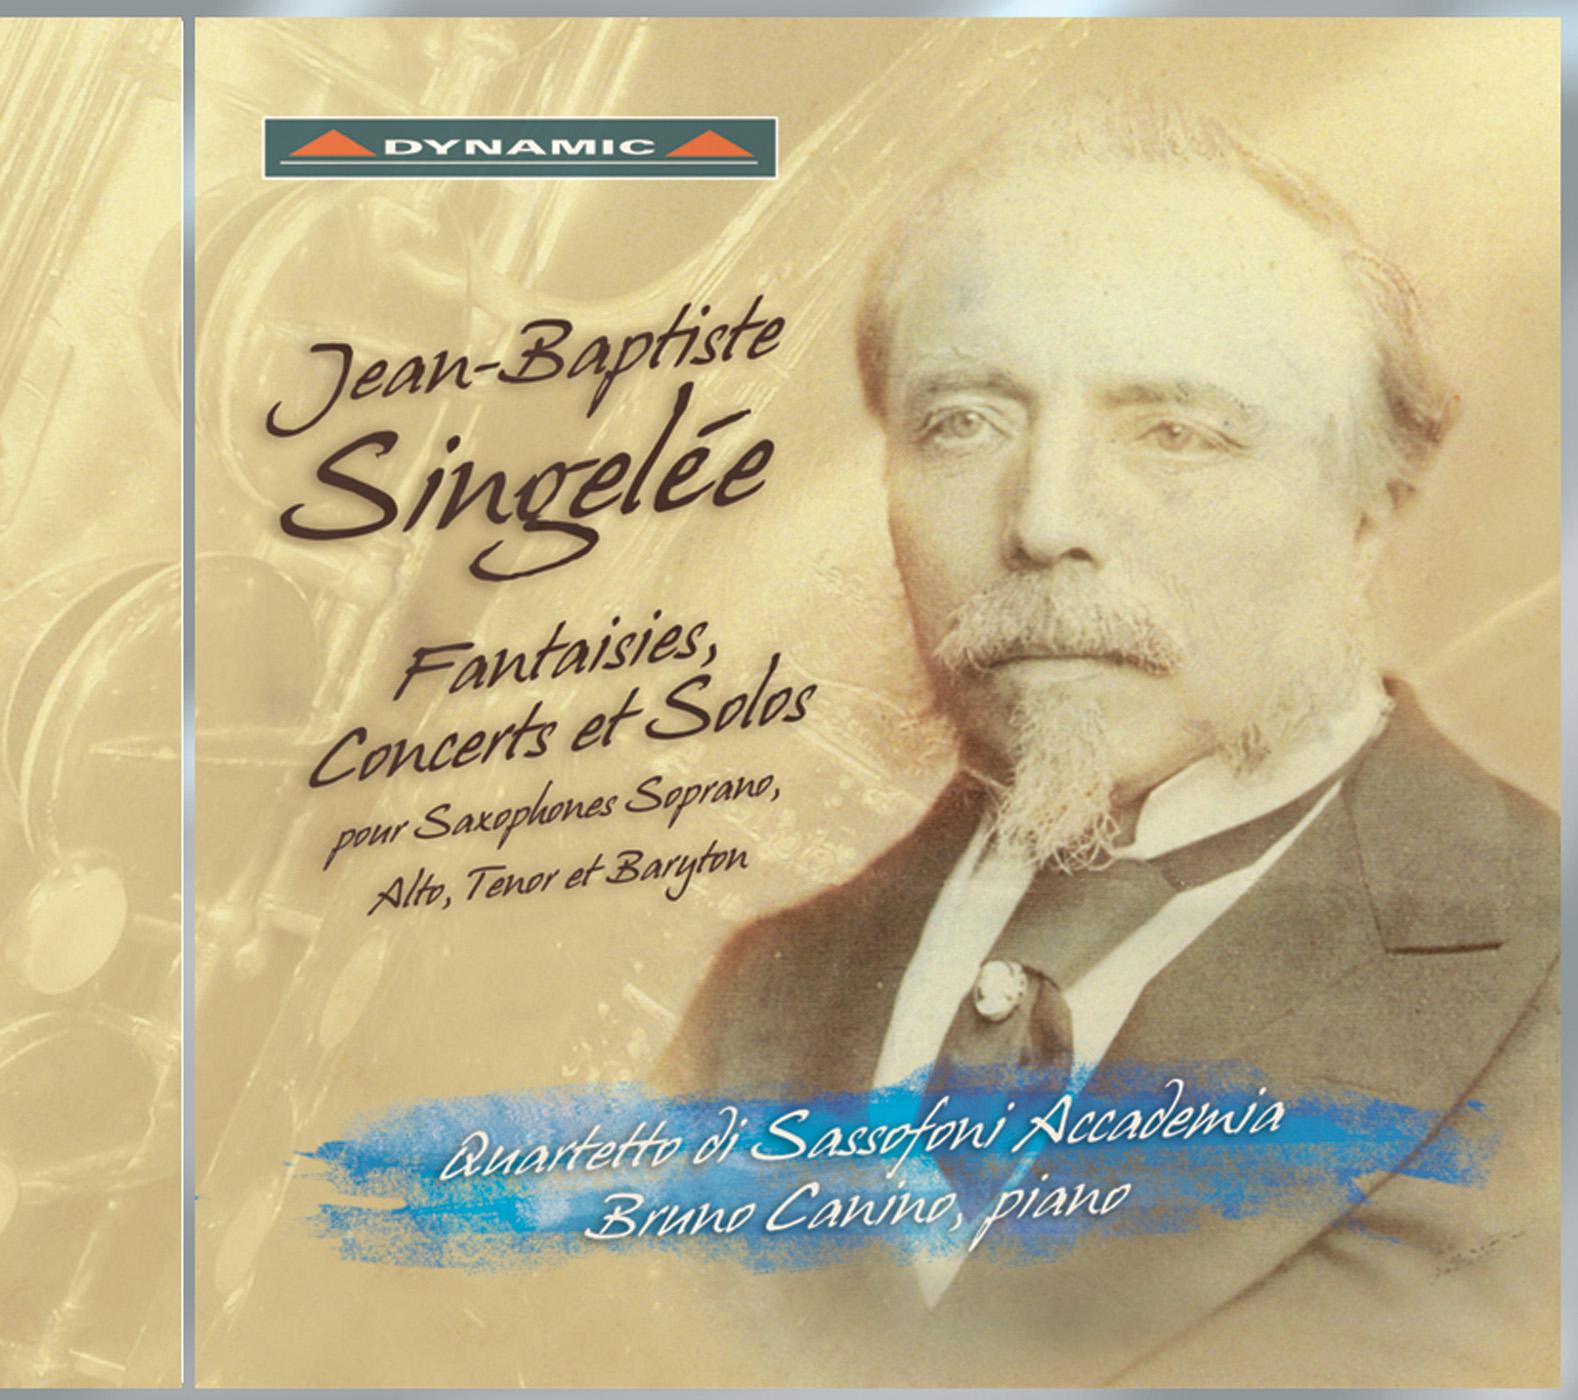 Singelee: Solo De Concert Nos. 3-7 - Duo Concertant - Fantaisies